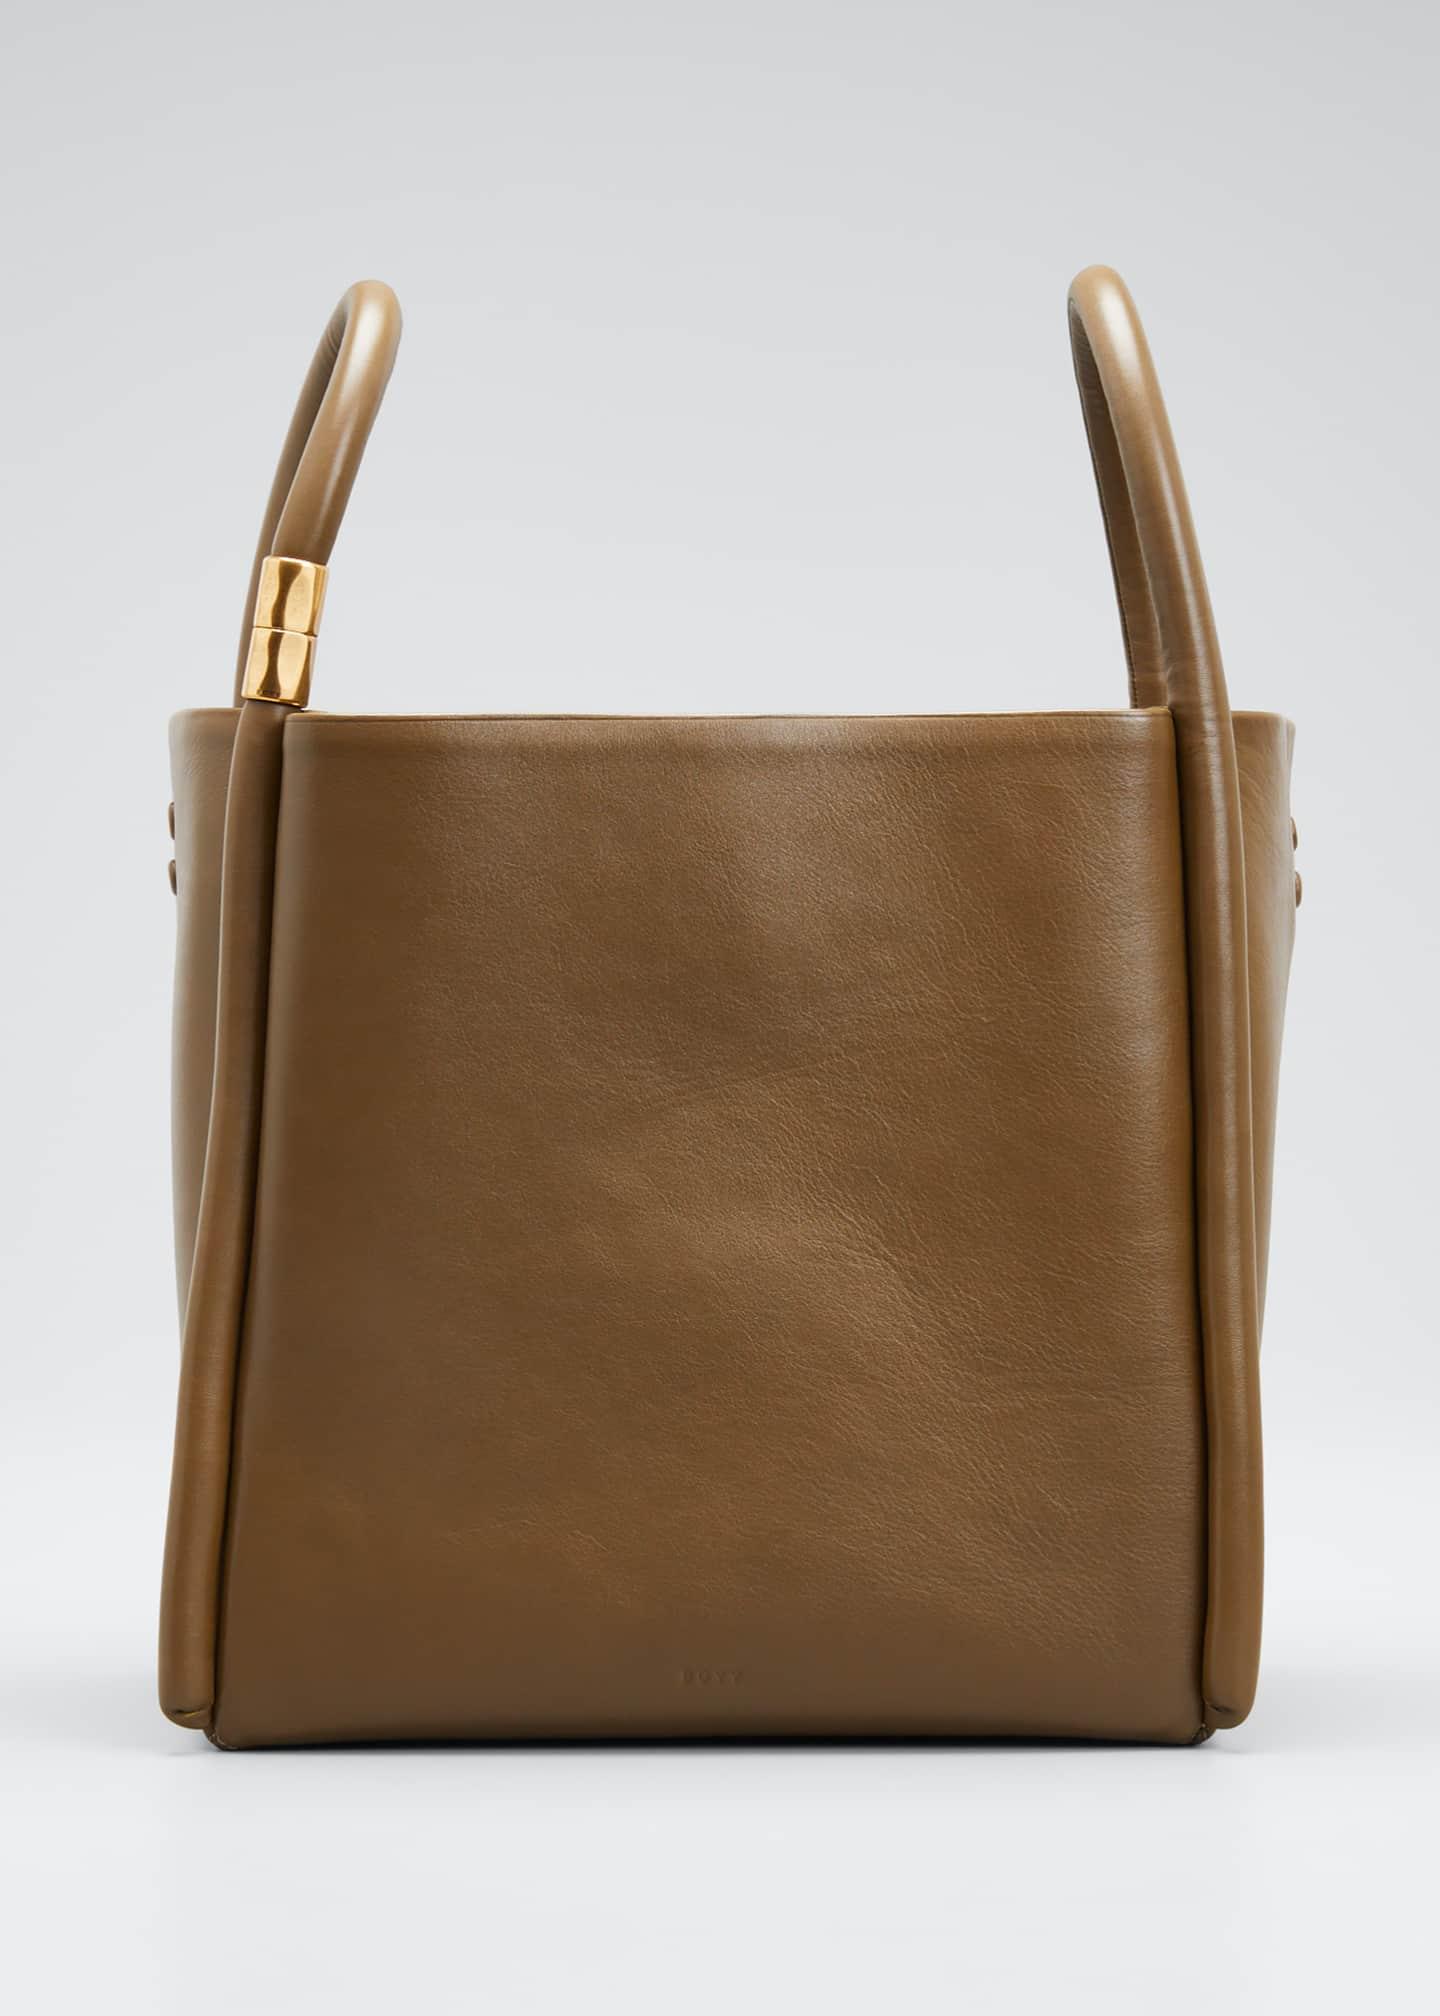 Boyy Lotus 28 Satchel Tote Bag